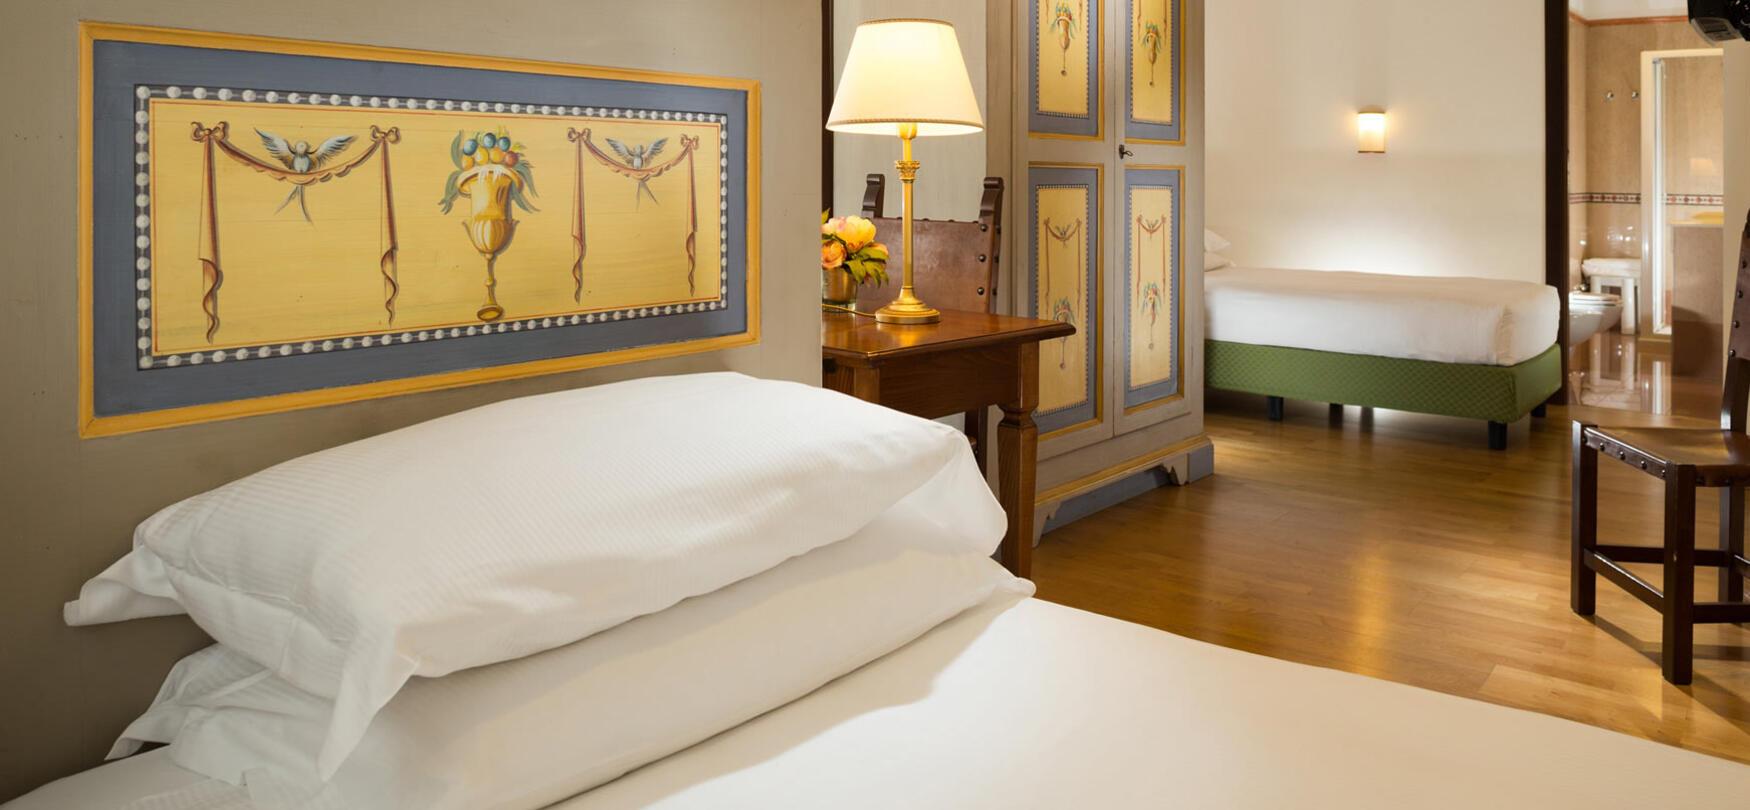 ambienthotels it palace-hotel 008